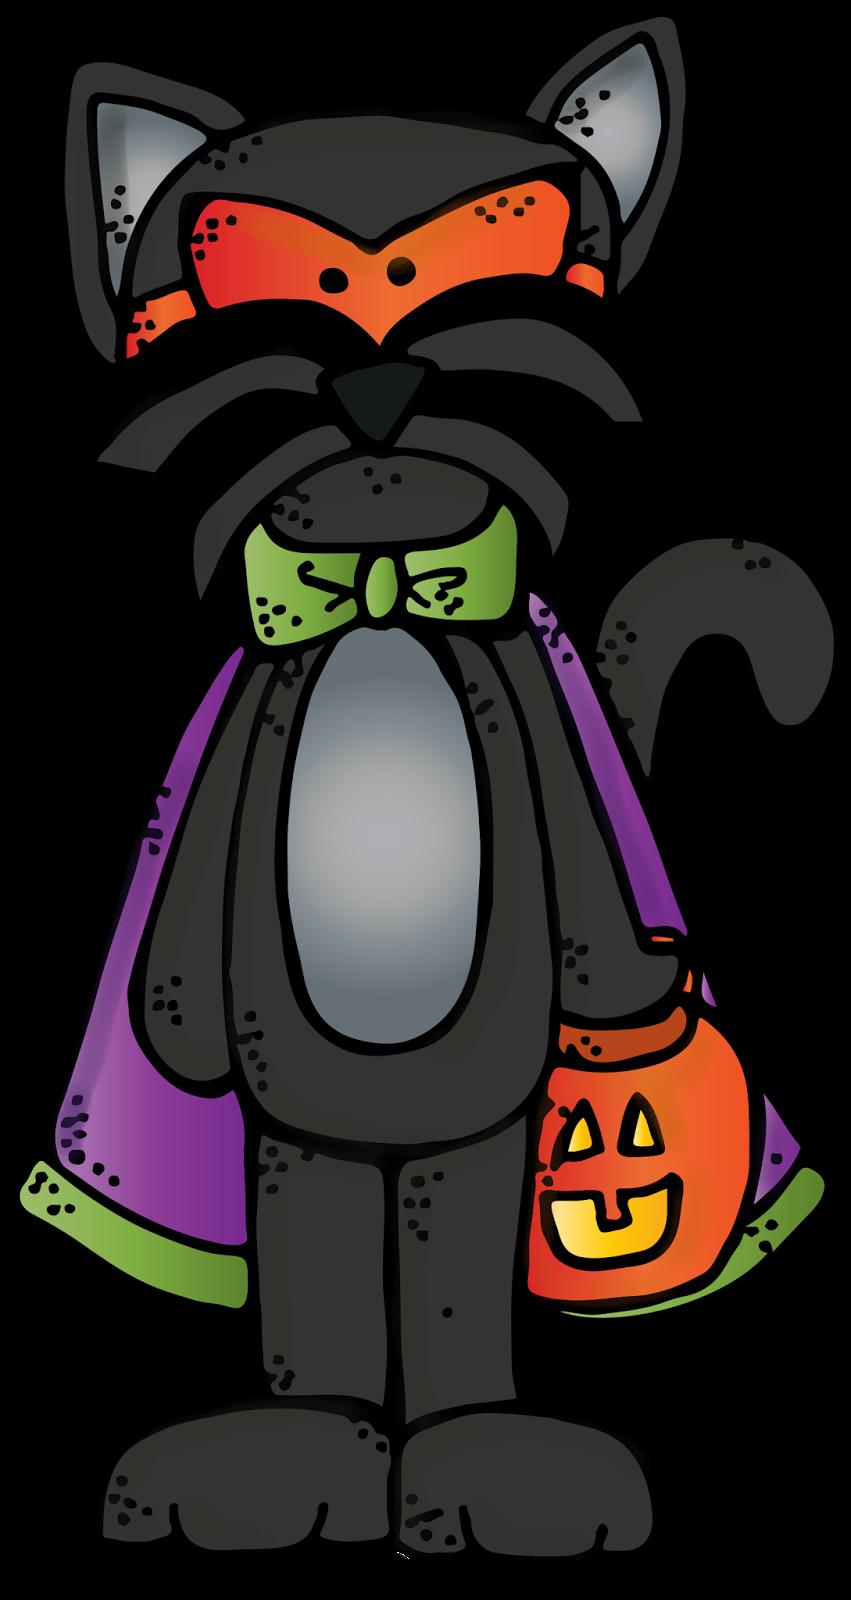 Witch clipart melonheadz. Cute ghost emoji clipground